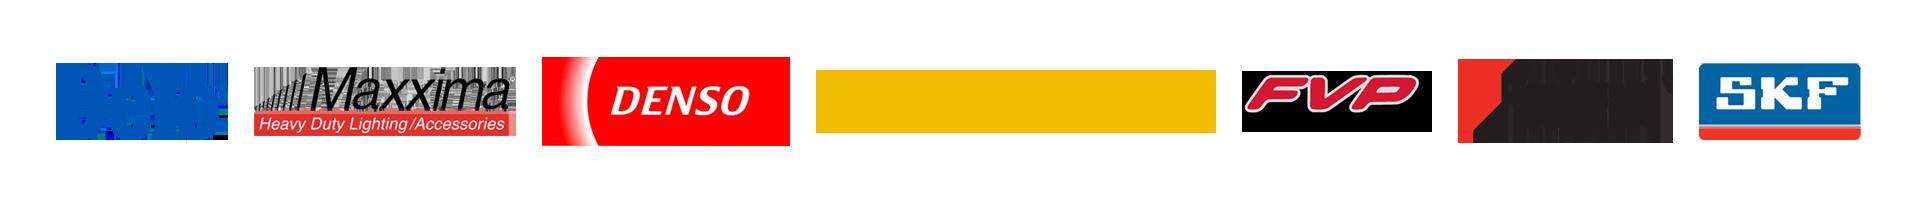 STTR-Vendor-logos